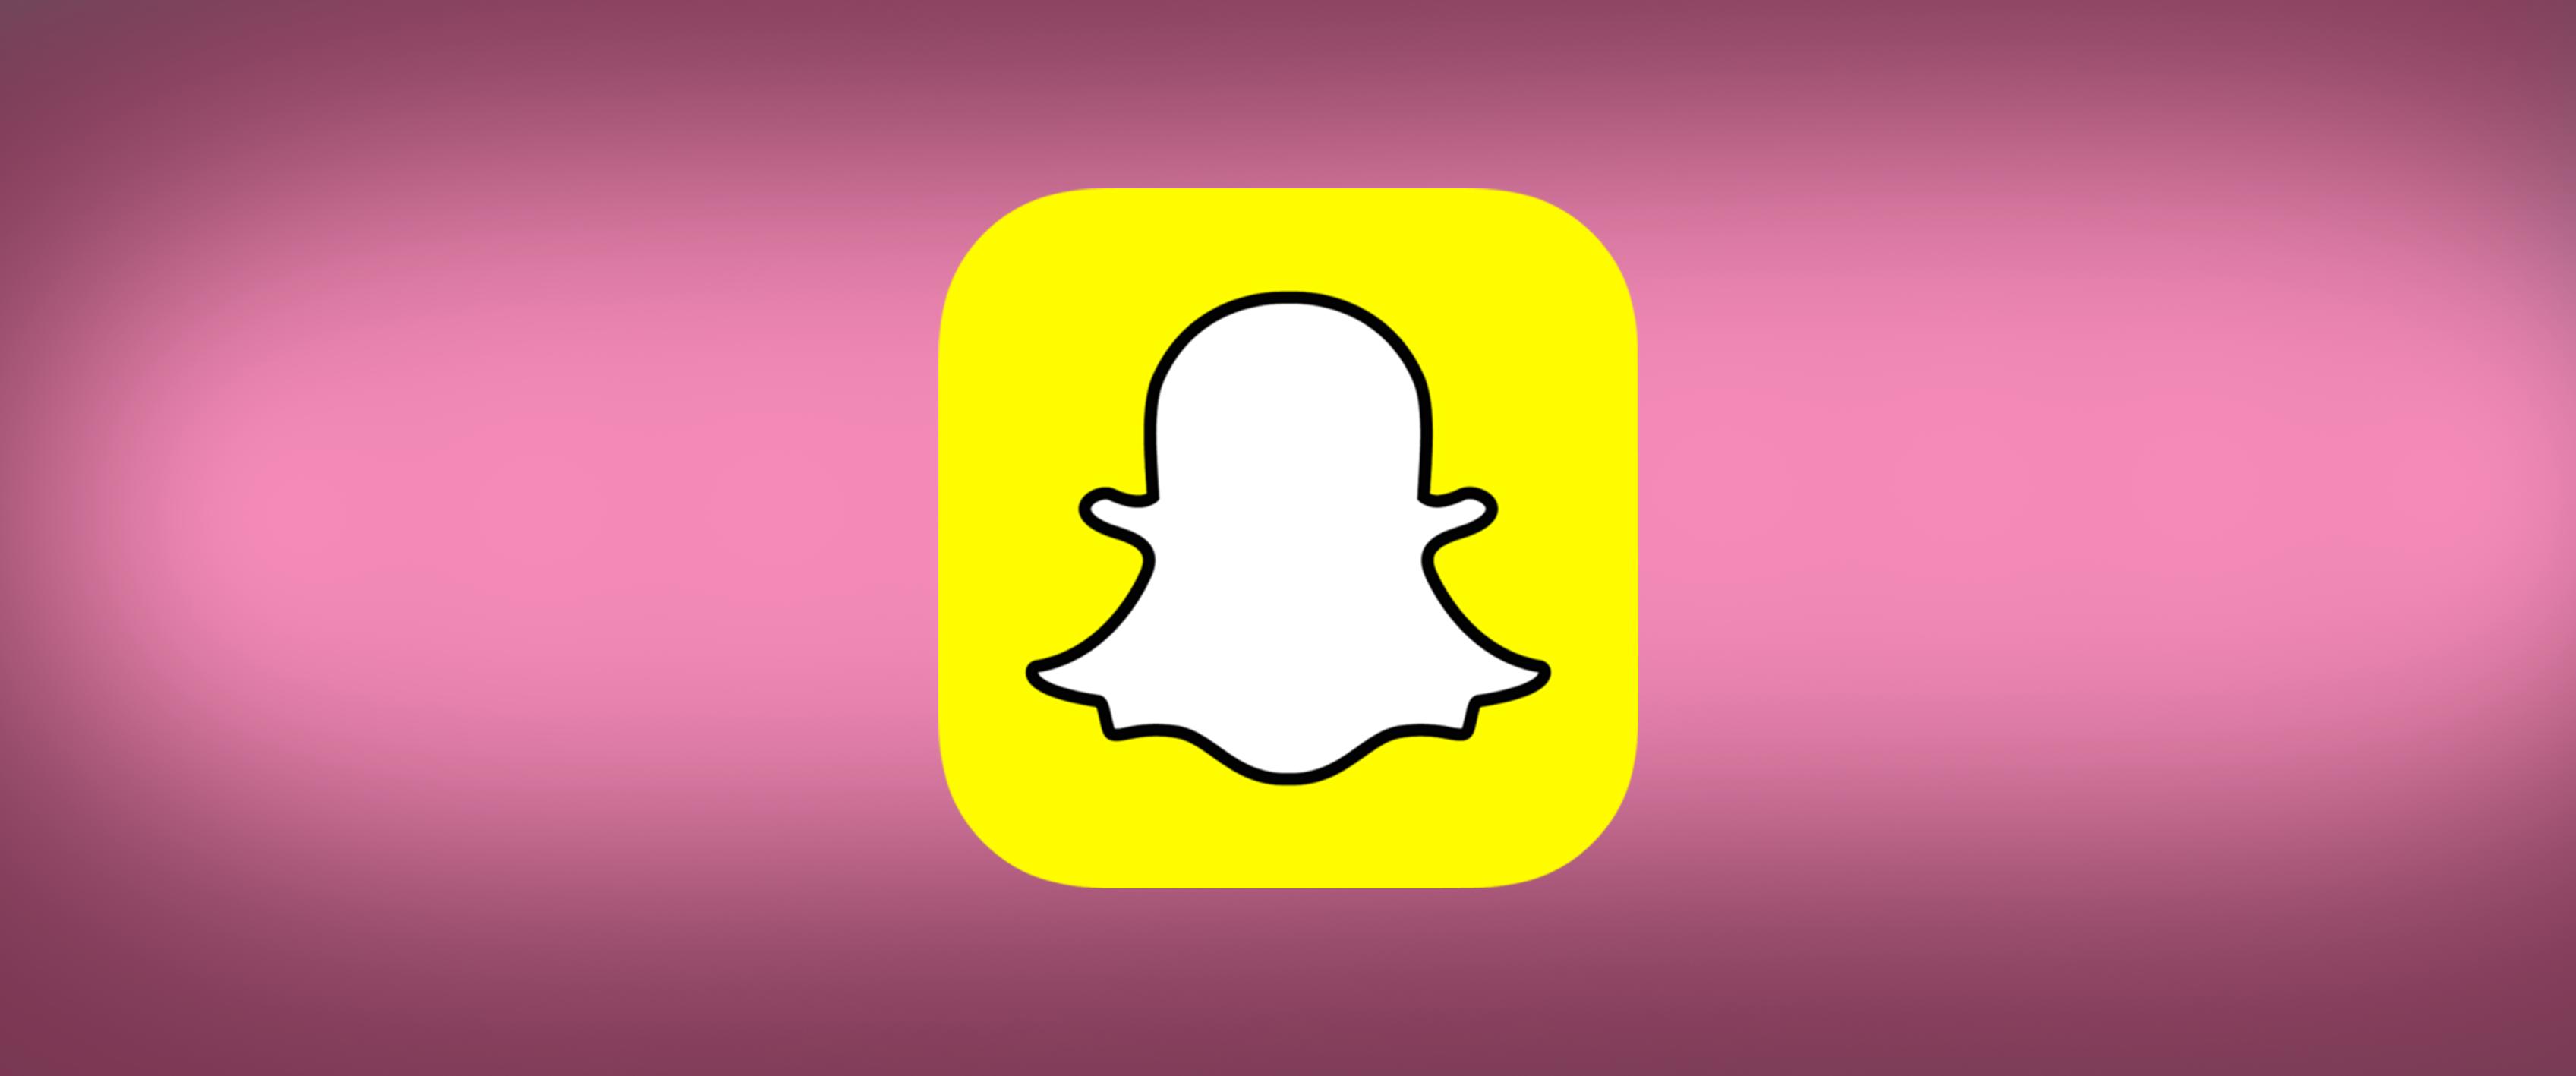 Snapchat teamtailor